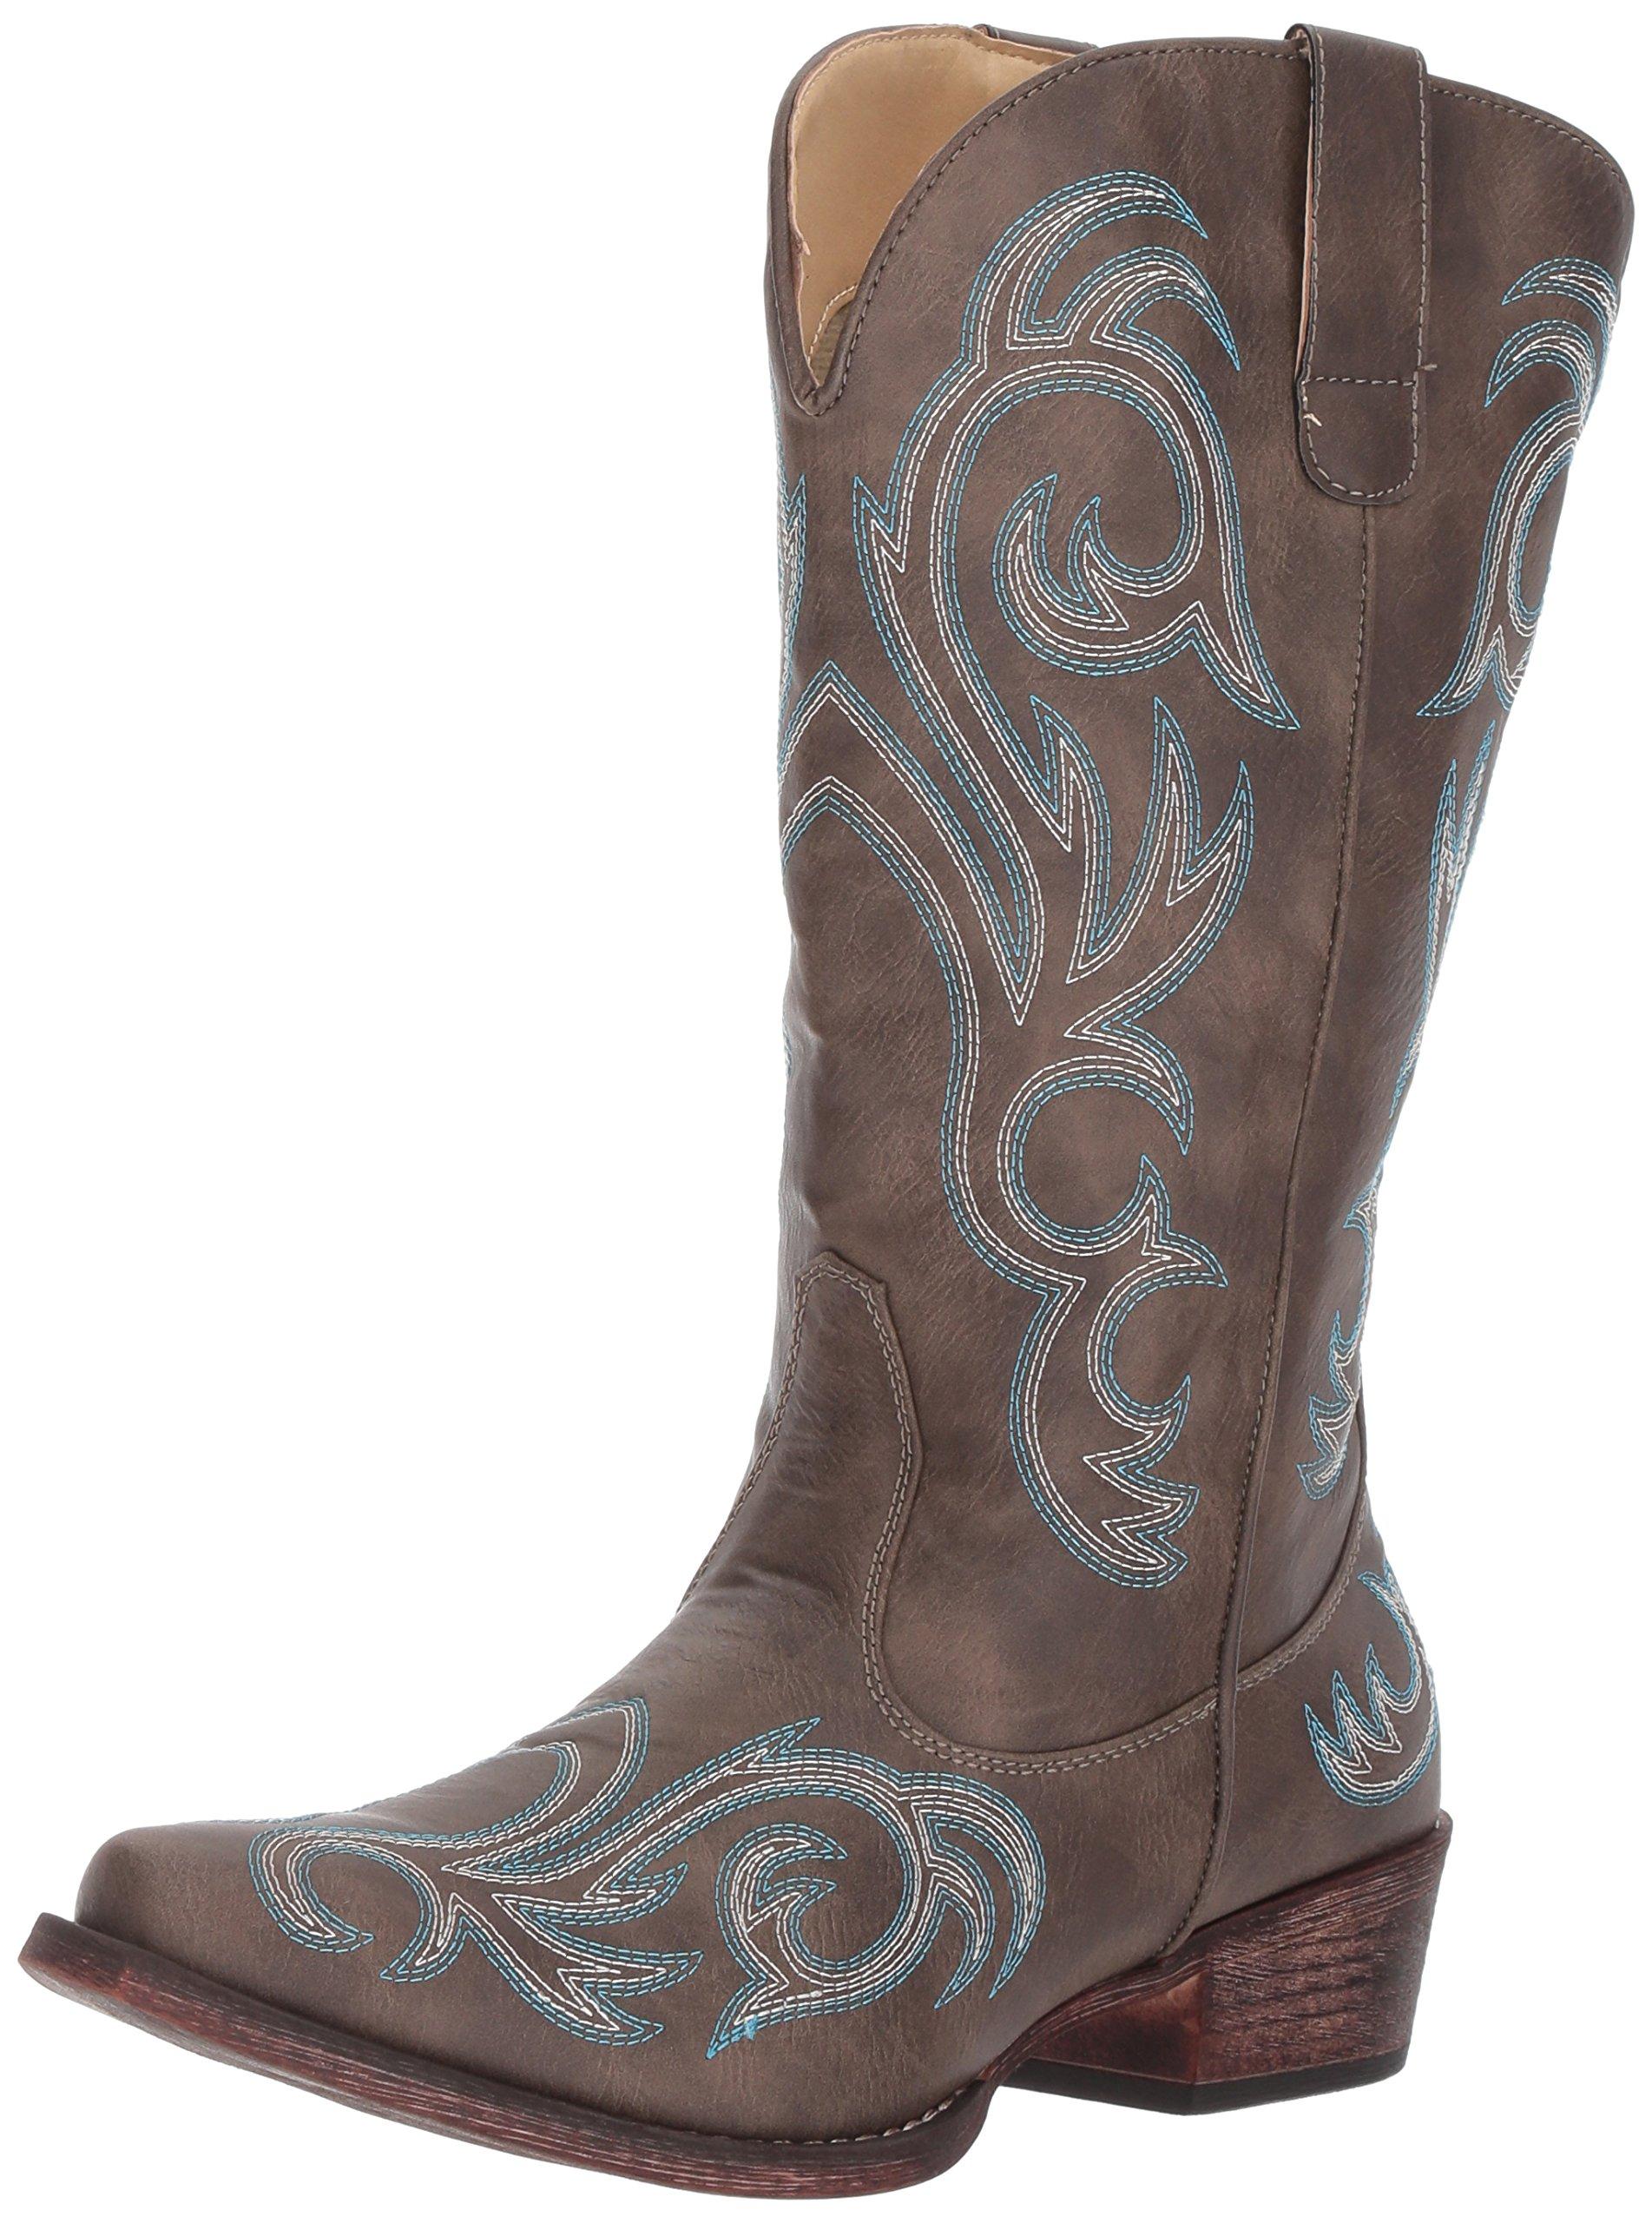 Roper Women's Riley Western Boot, Brown, 8 D US